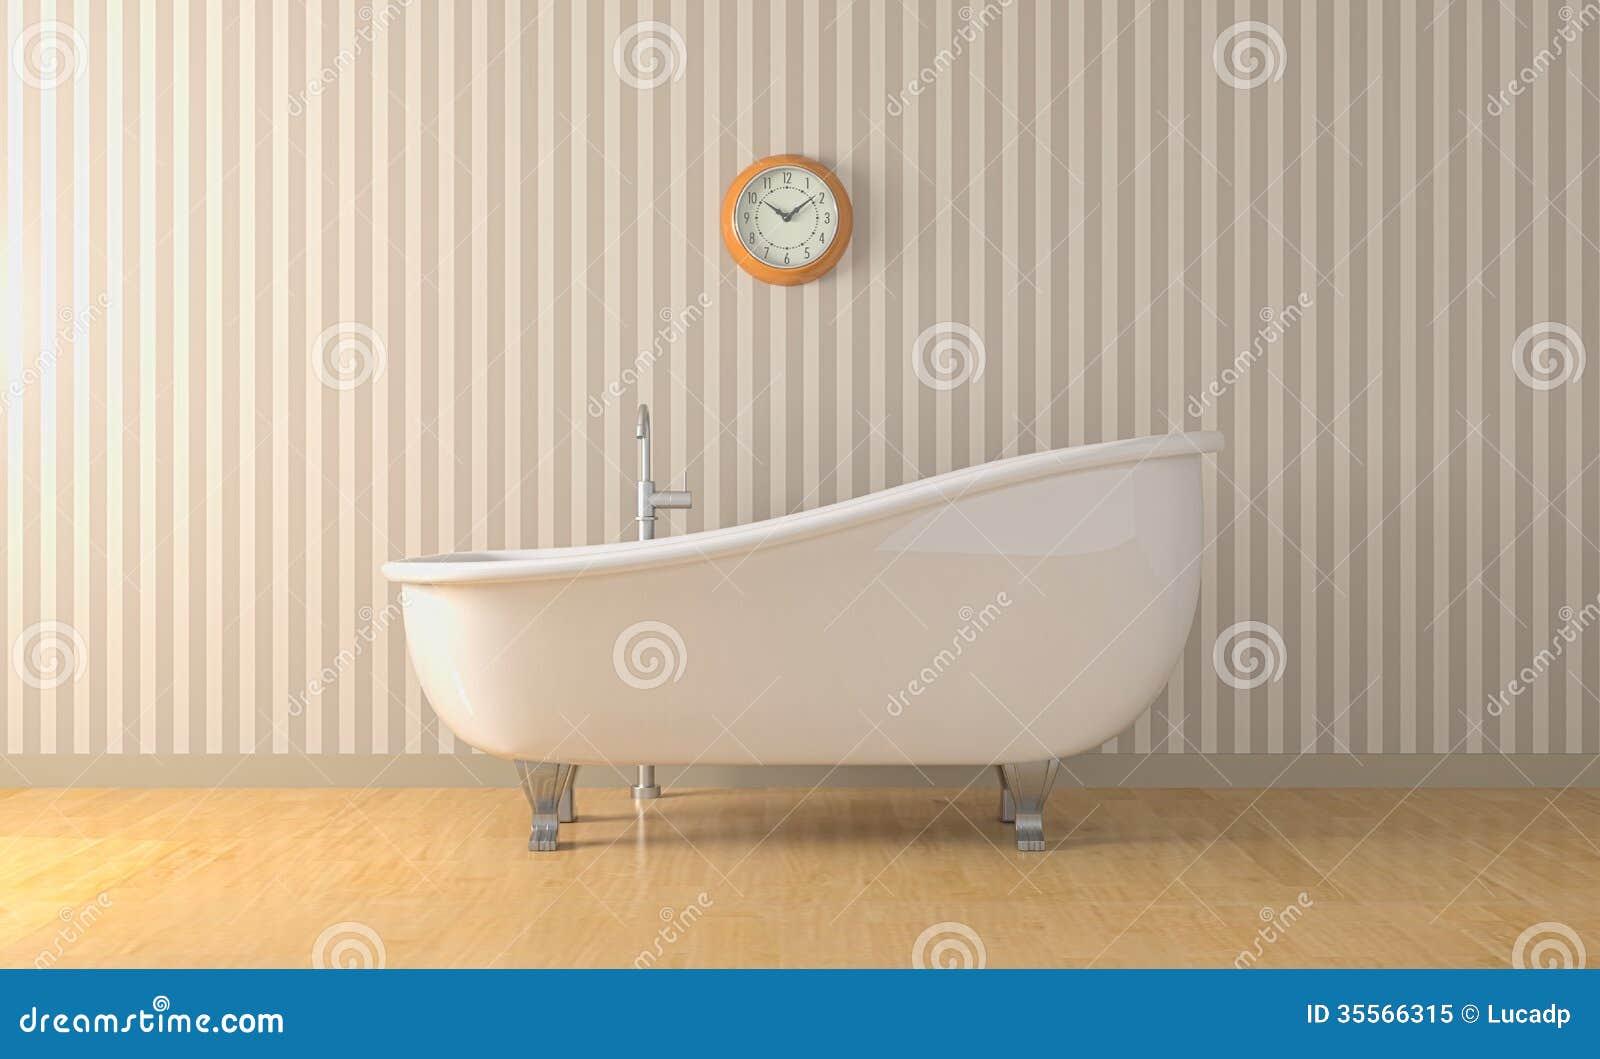 Cool Tub Paint Thin How To Paint A Bathtub Flat Paint Bathtub Paint For Bathtub Young Bath Tub Paint Bright Bath Refinishing Service